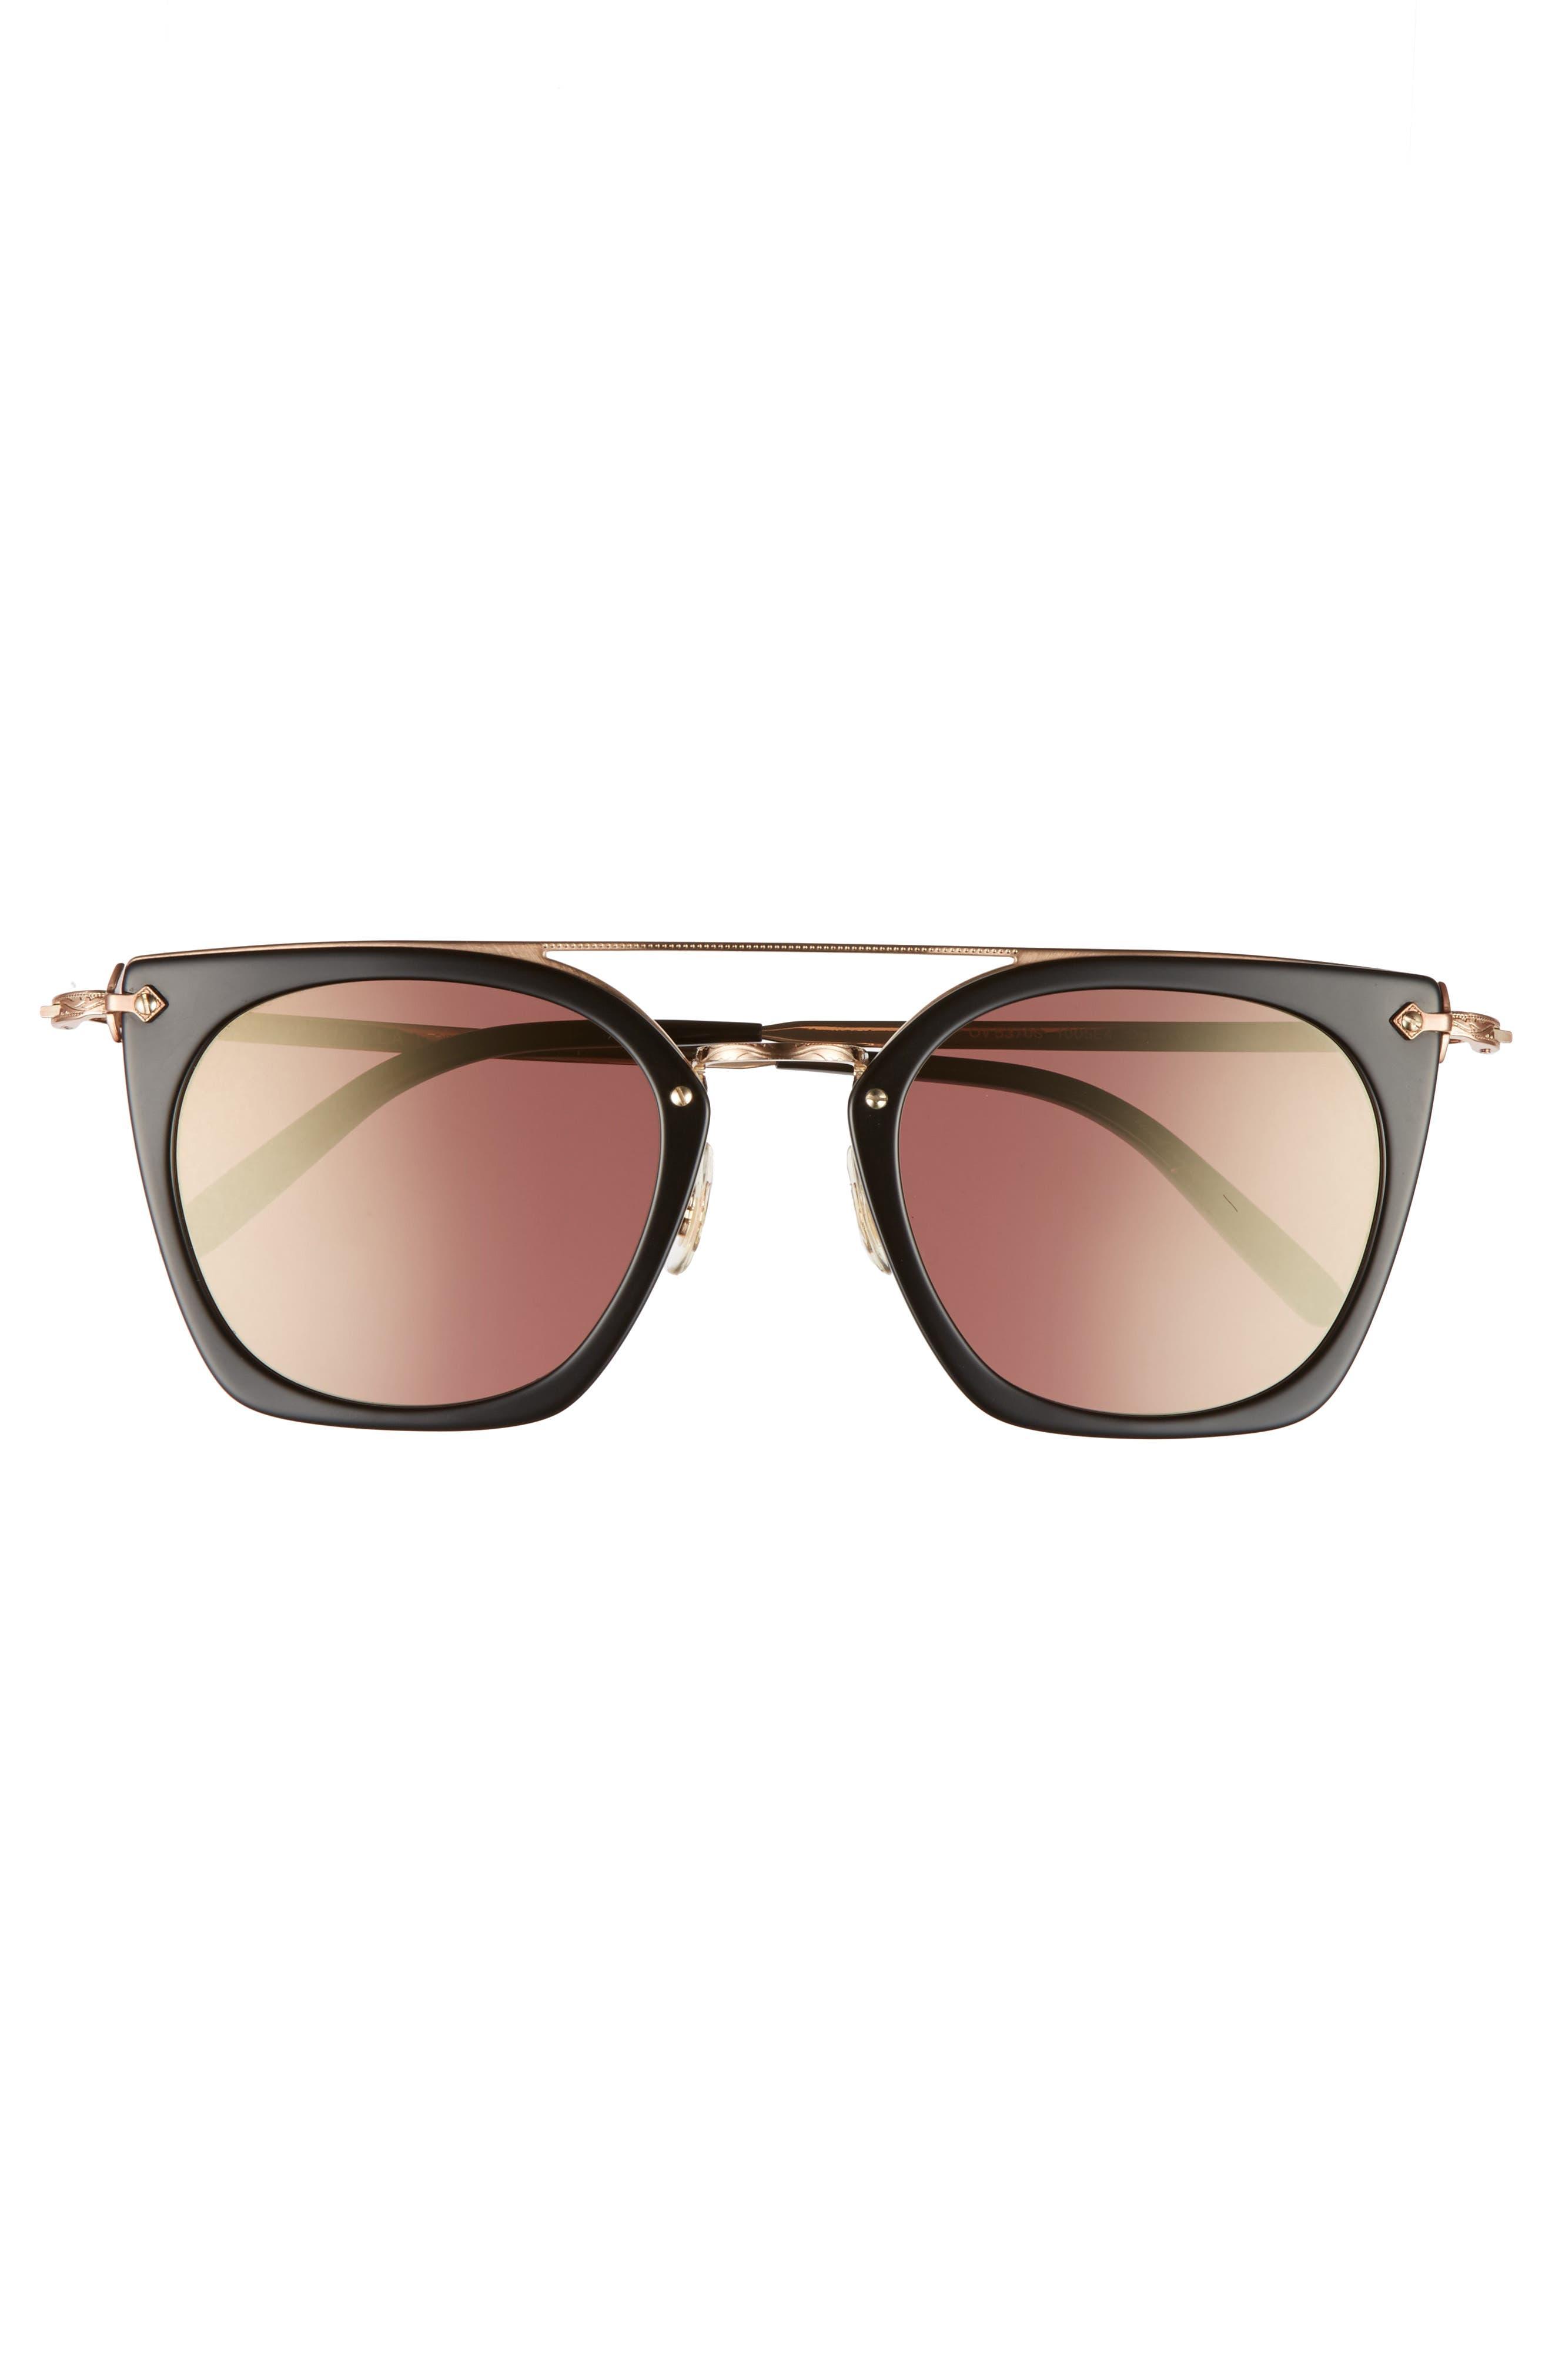 Dacette 50mm Square Aviator Sunglasses,                             Alternate thumbnail 3, color,                             BLACK/ ROSE GOLD